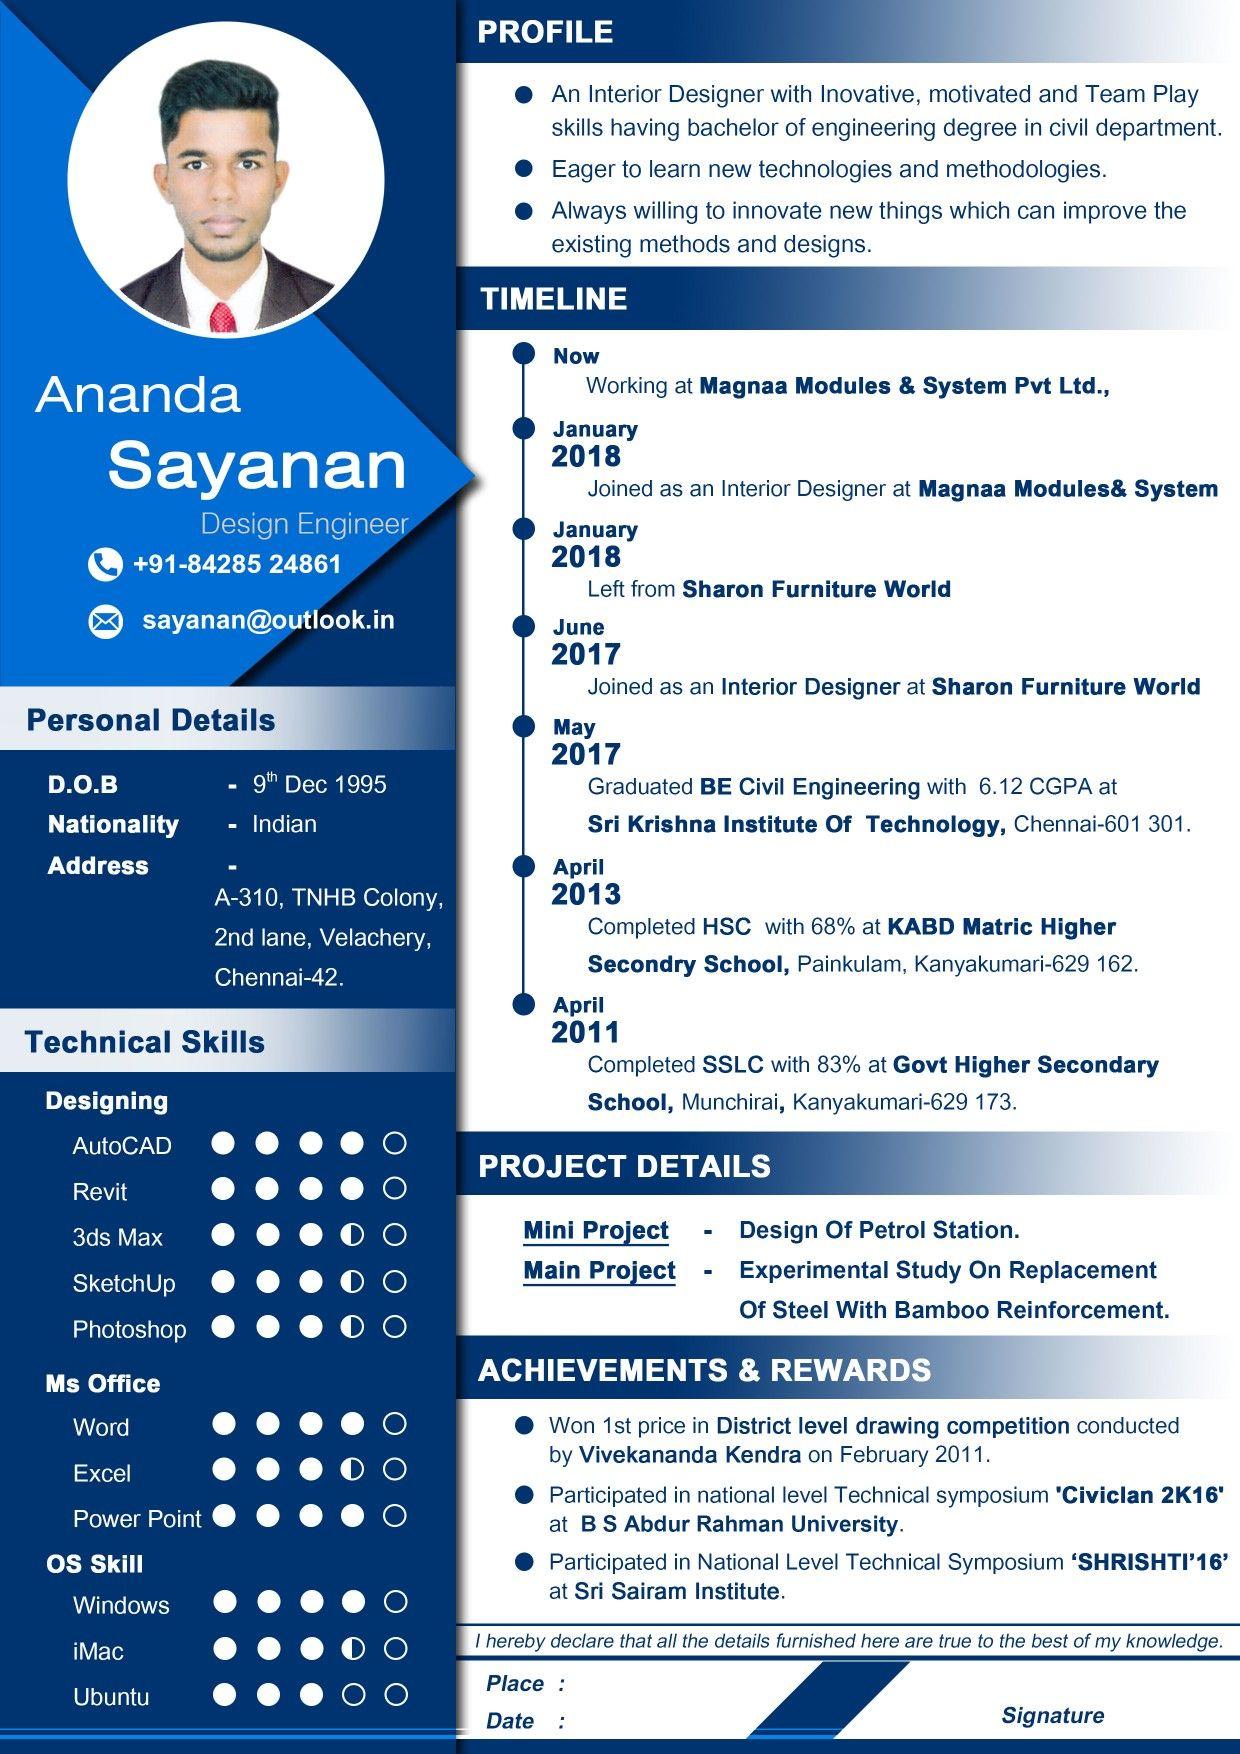 Professional Resume For Designer Curriculum Vitae Best Resume Idea Top 10 Resume Format Engineer Resume Cv Kreatif Desain Resume Desain Cv